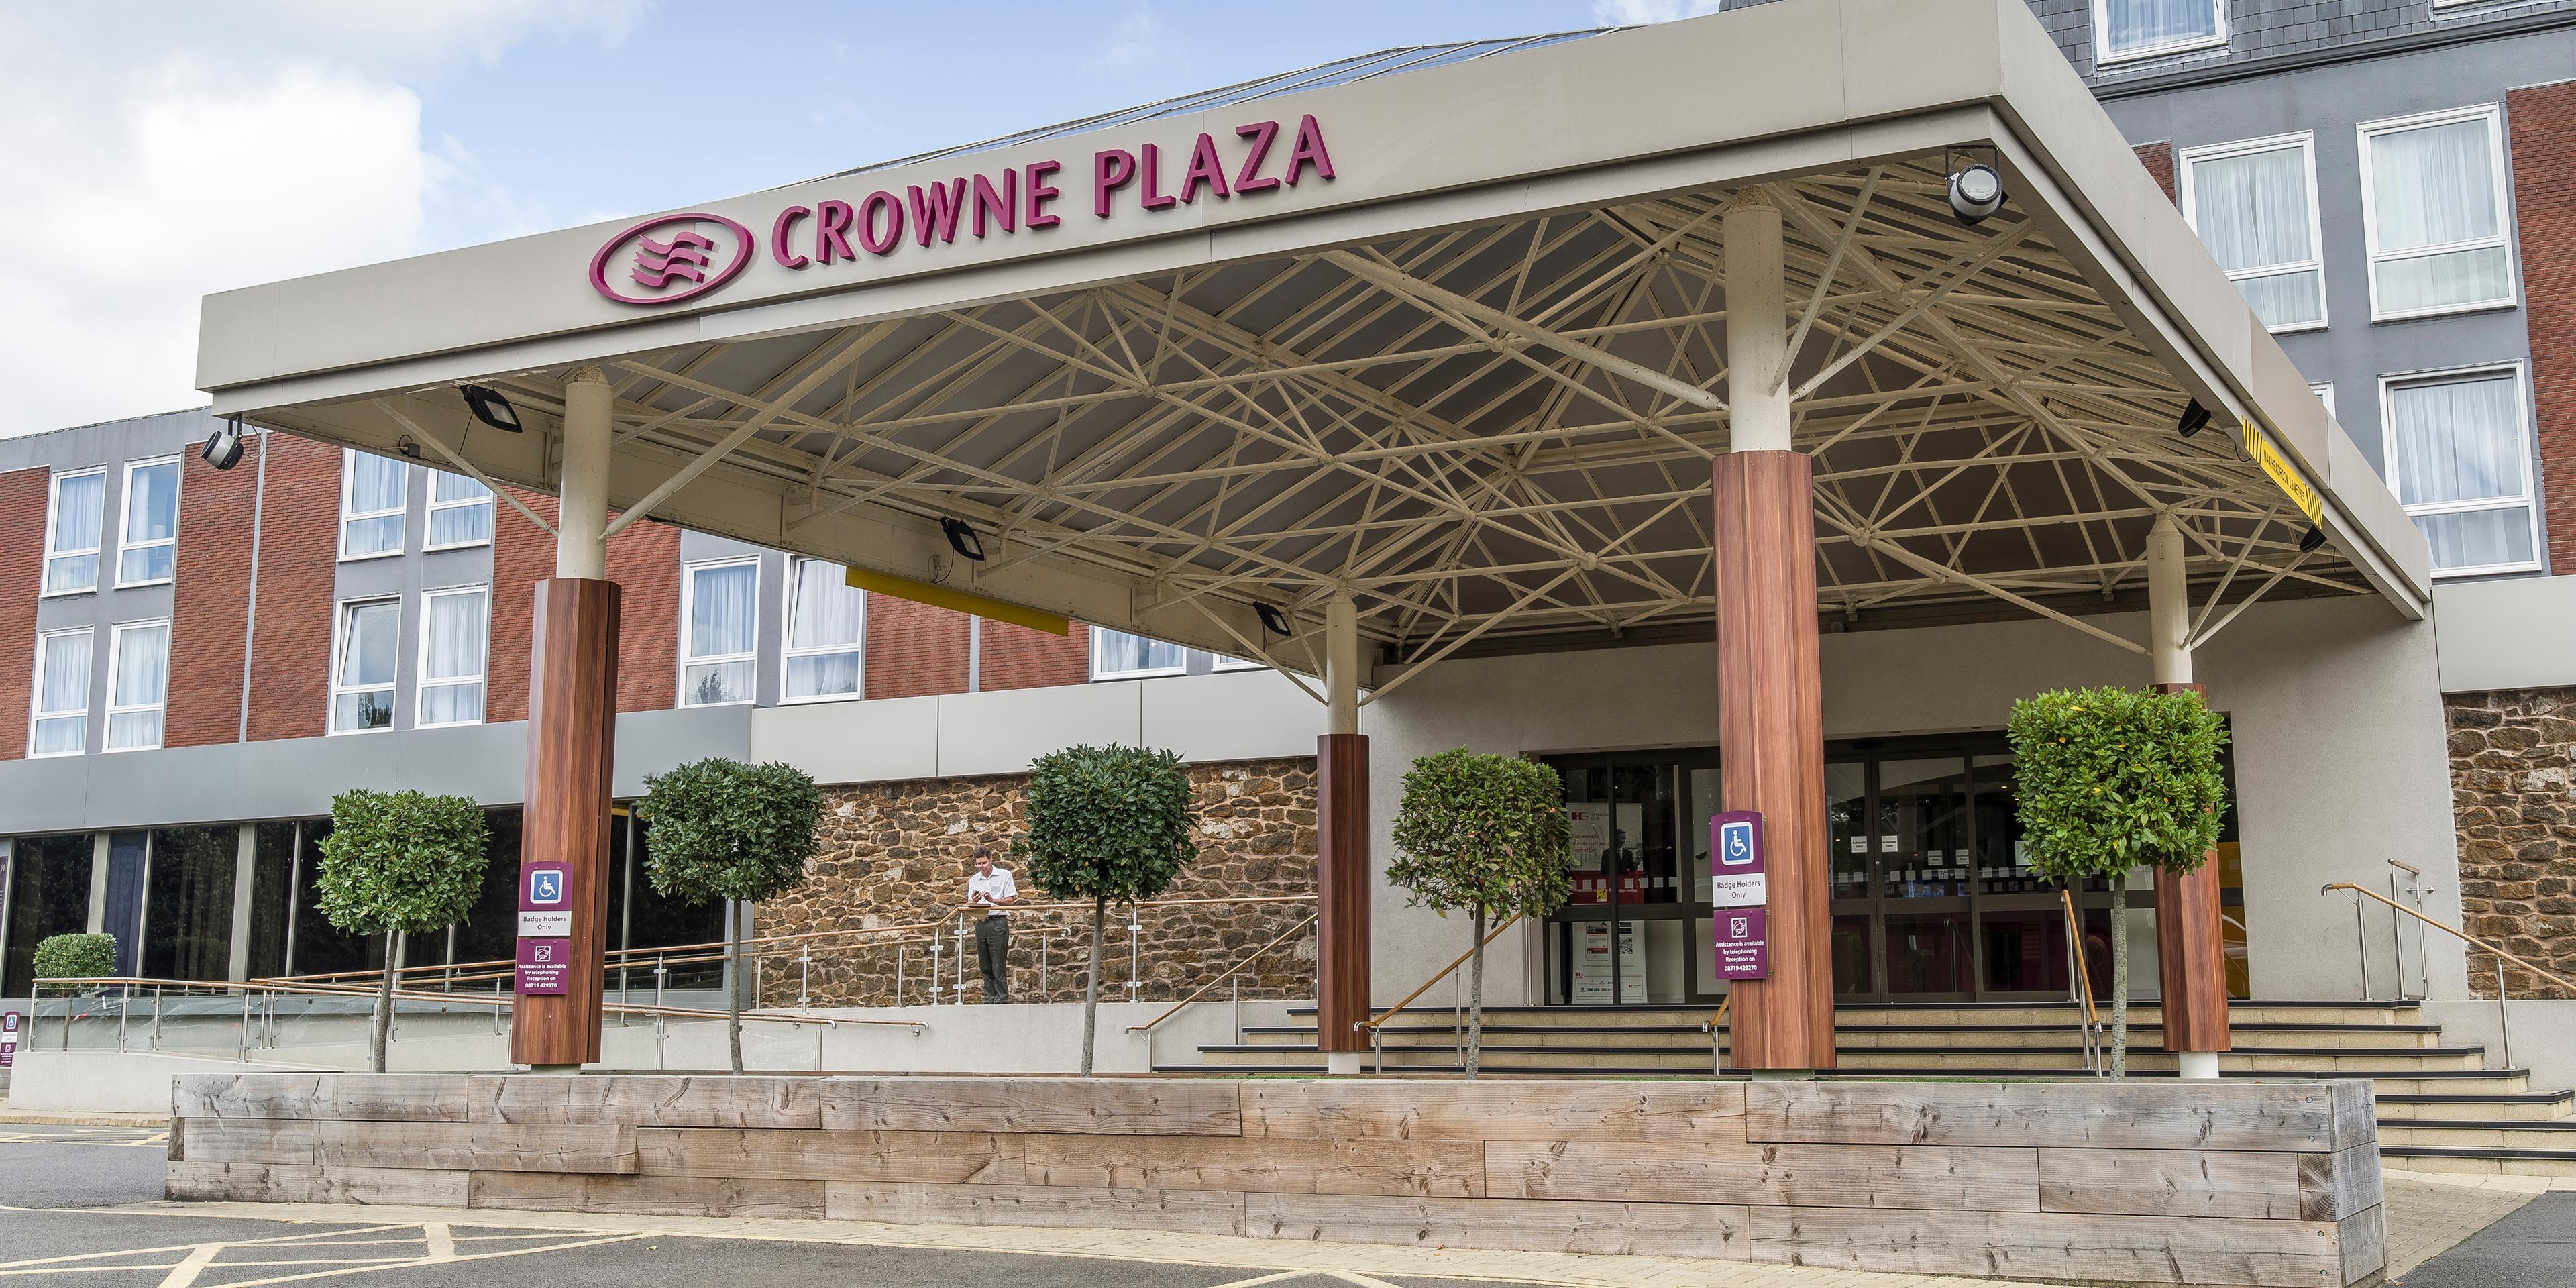 crowne-plaza-stratford-upon-avon-4687419976-2x1